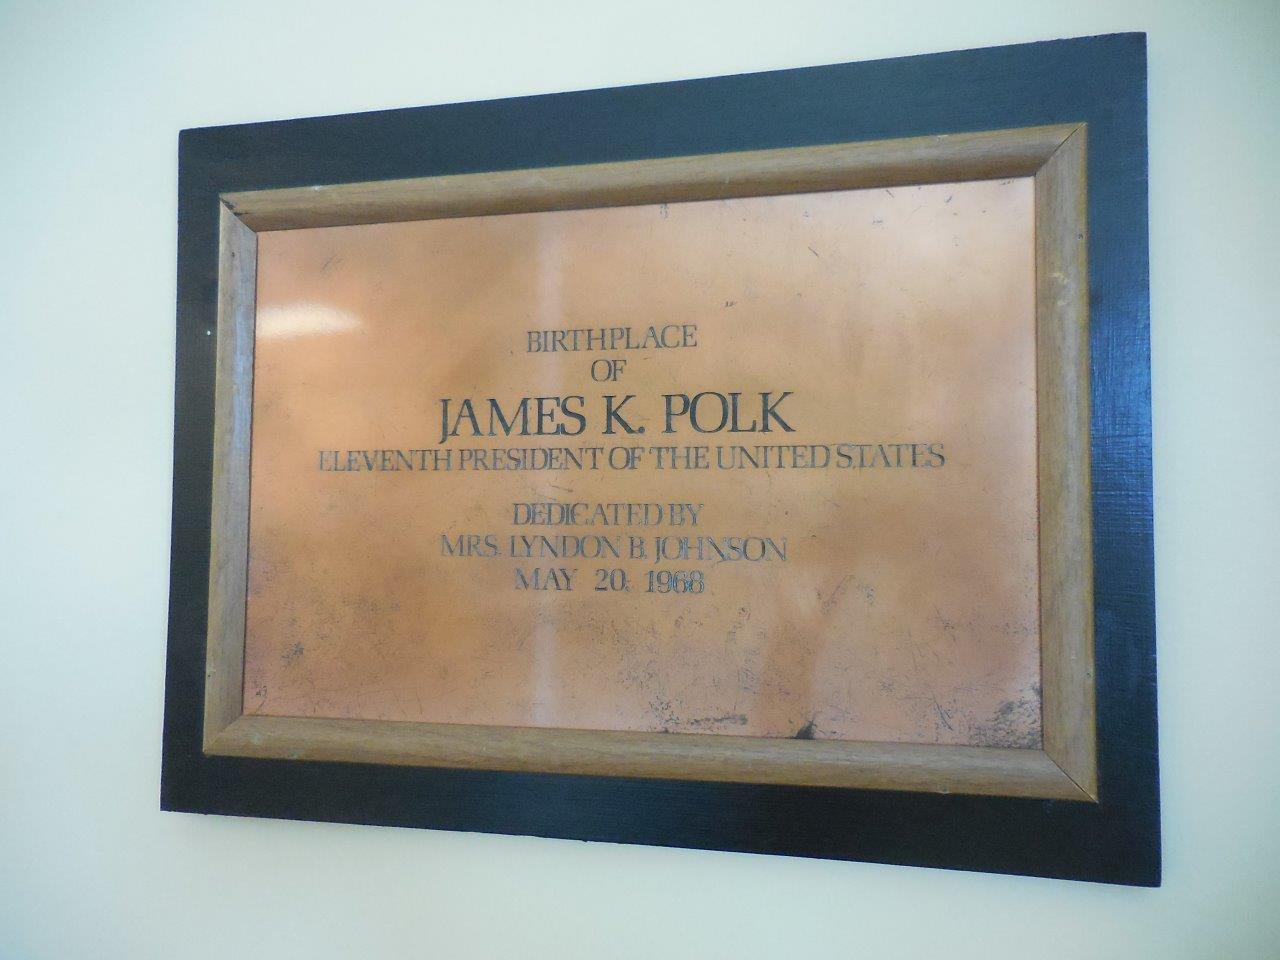 James Polk birthplace - Pineville, North Carolina